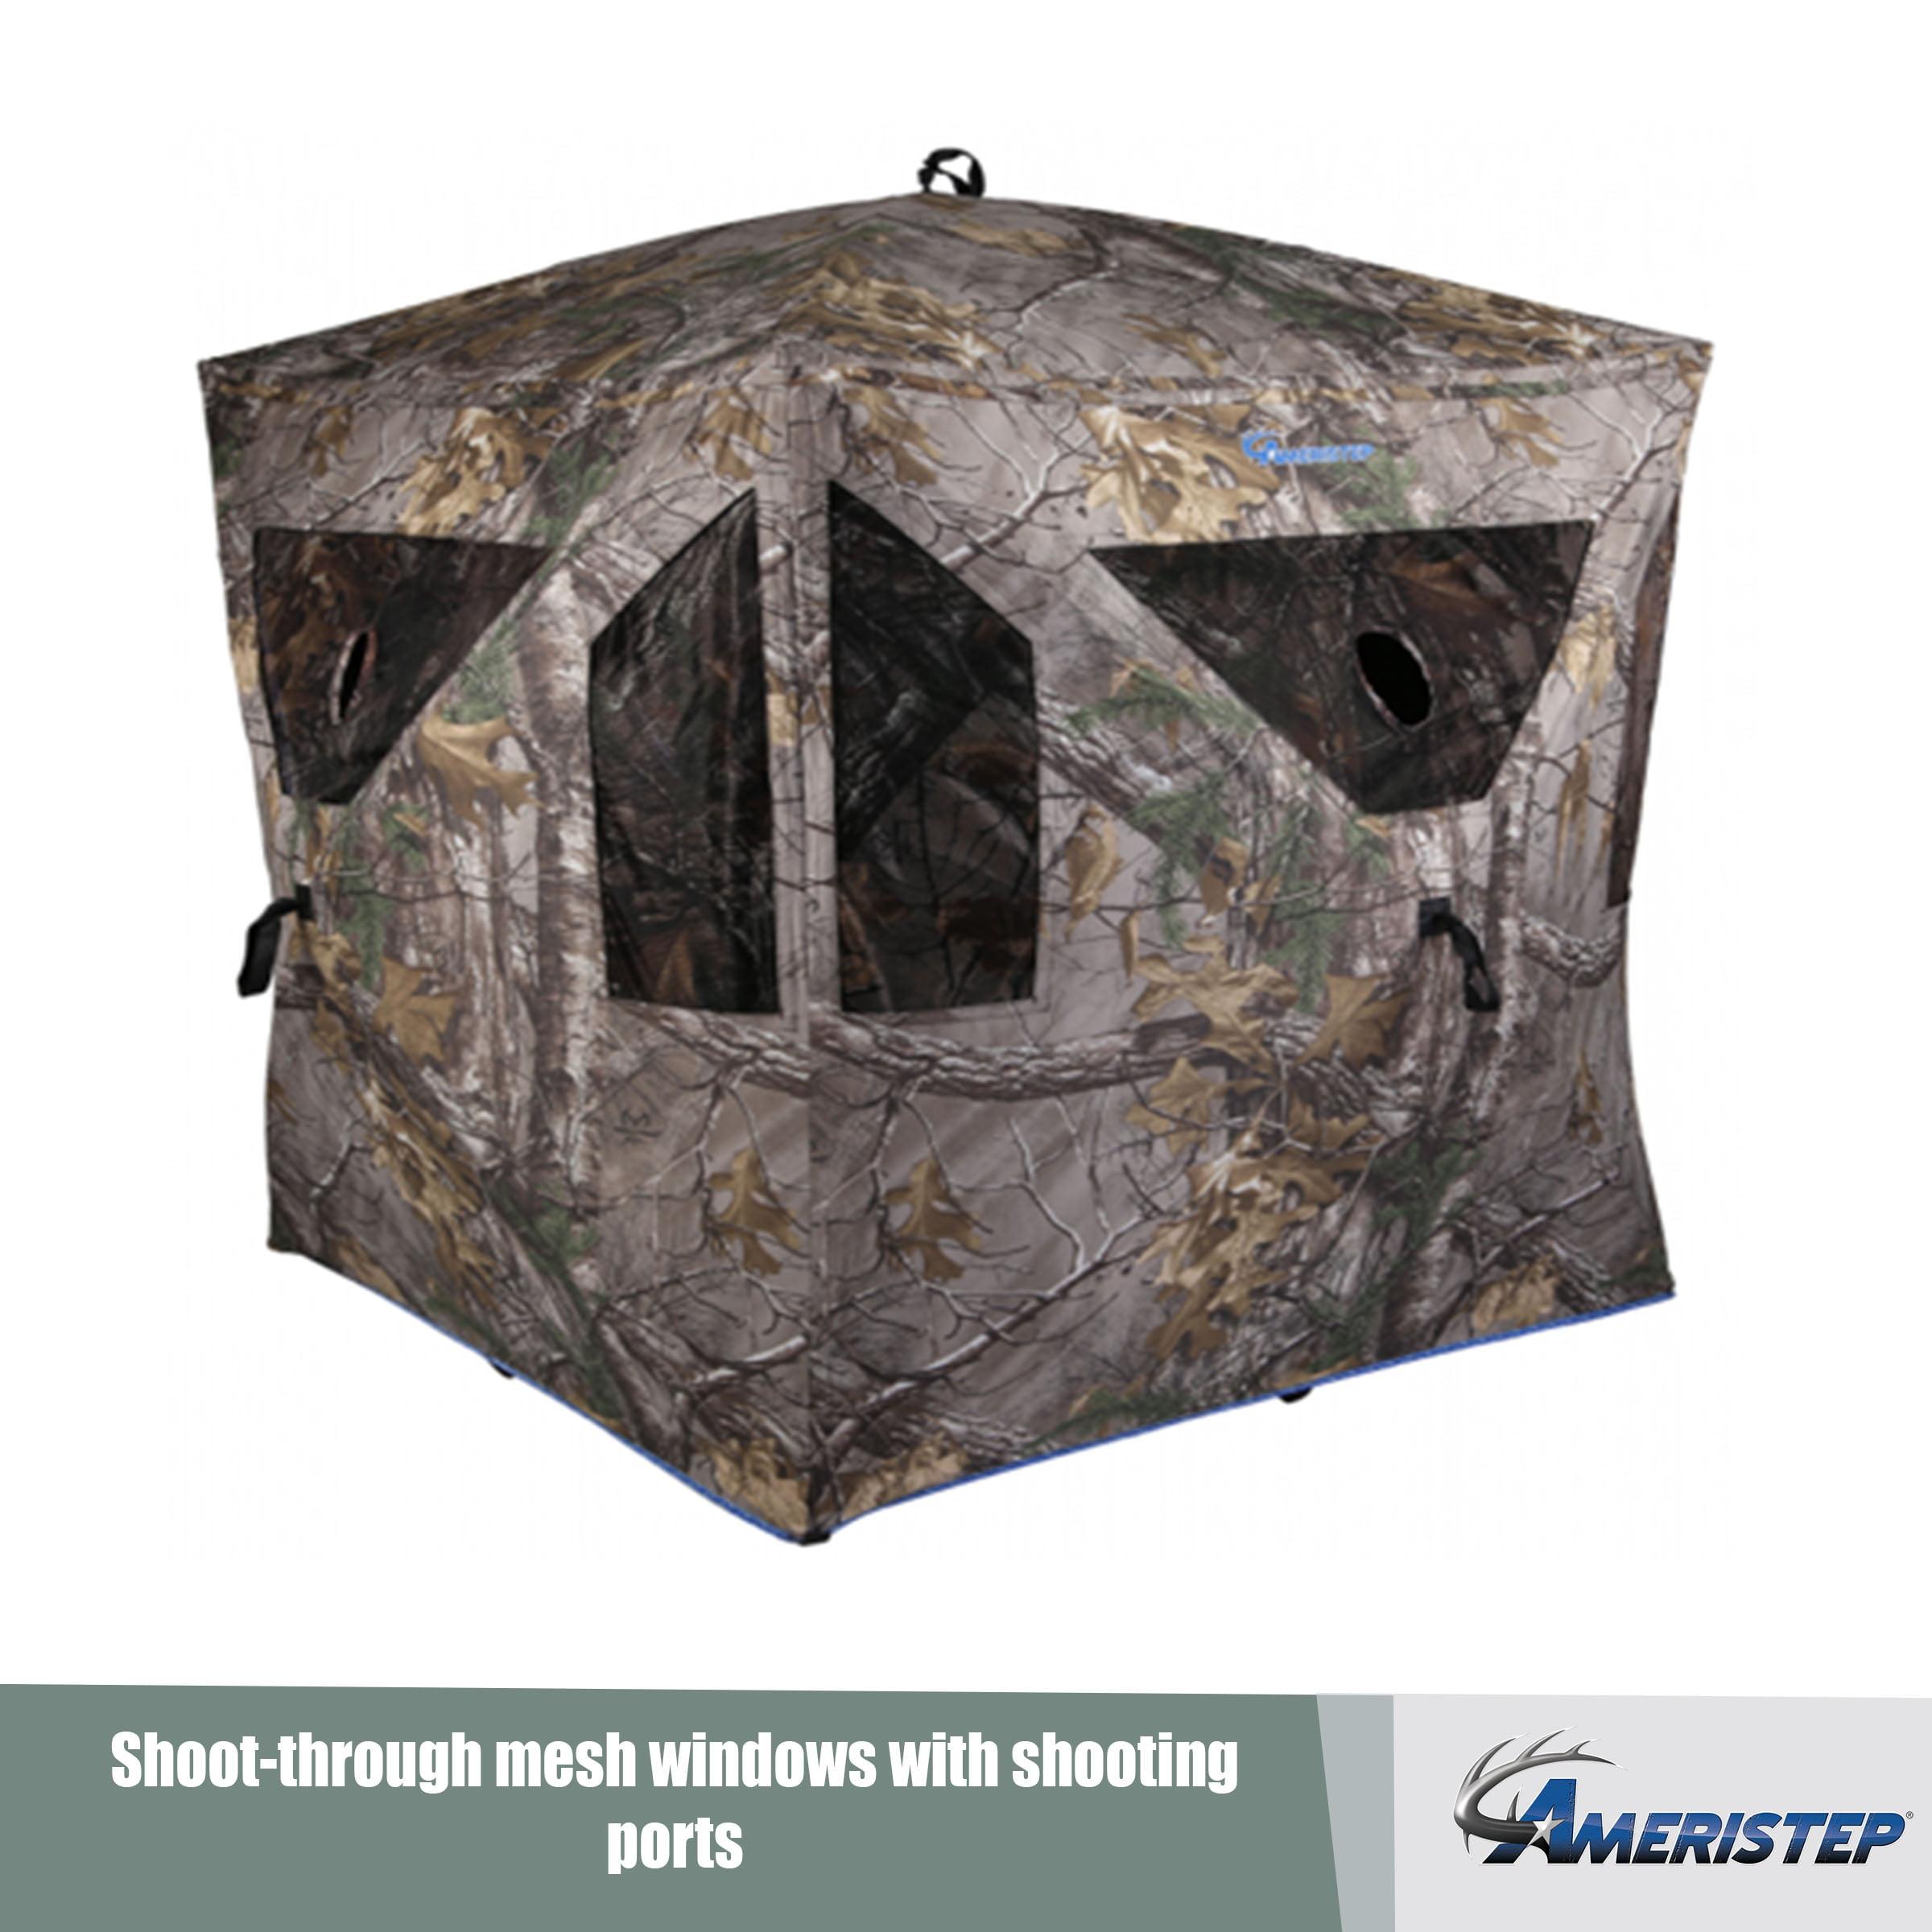 Ameristep Legend Hub Deer Hunting Blind With Shadowguard